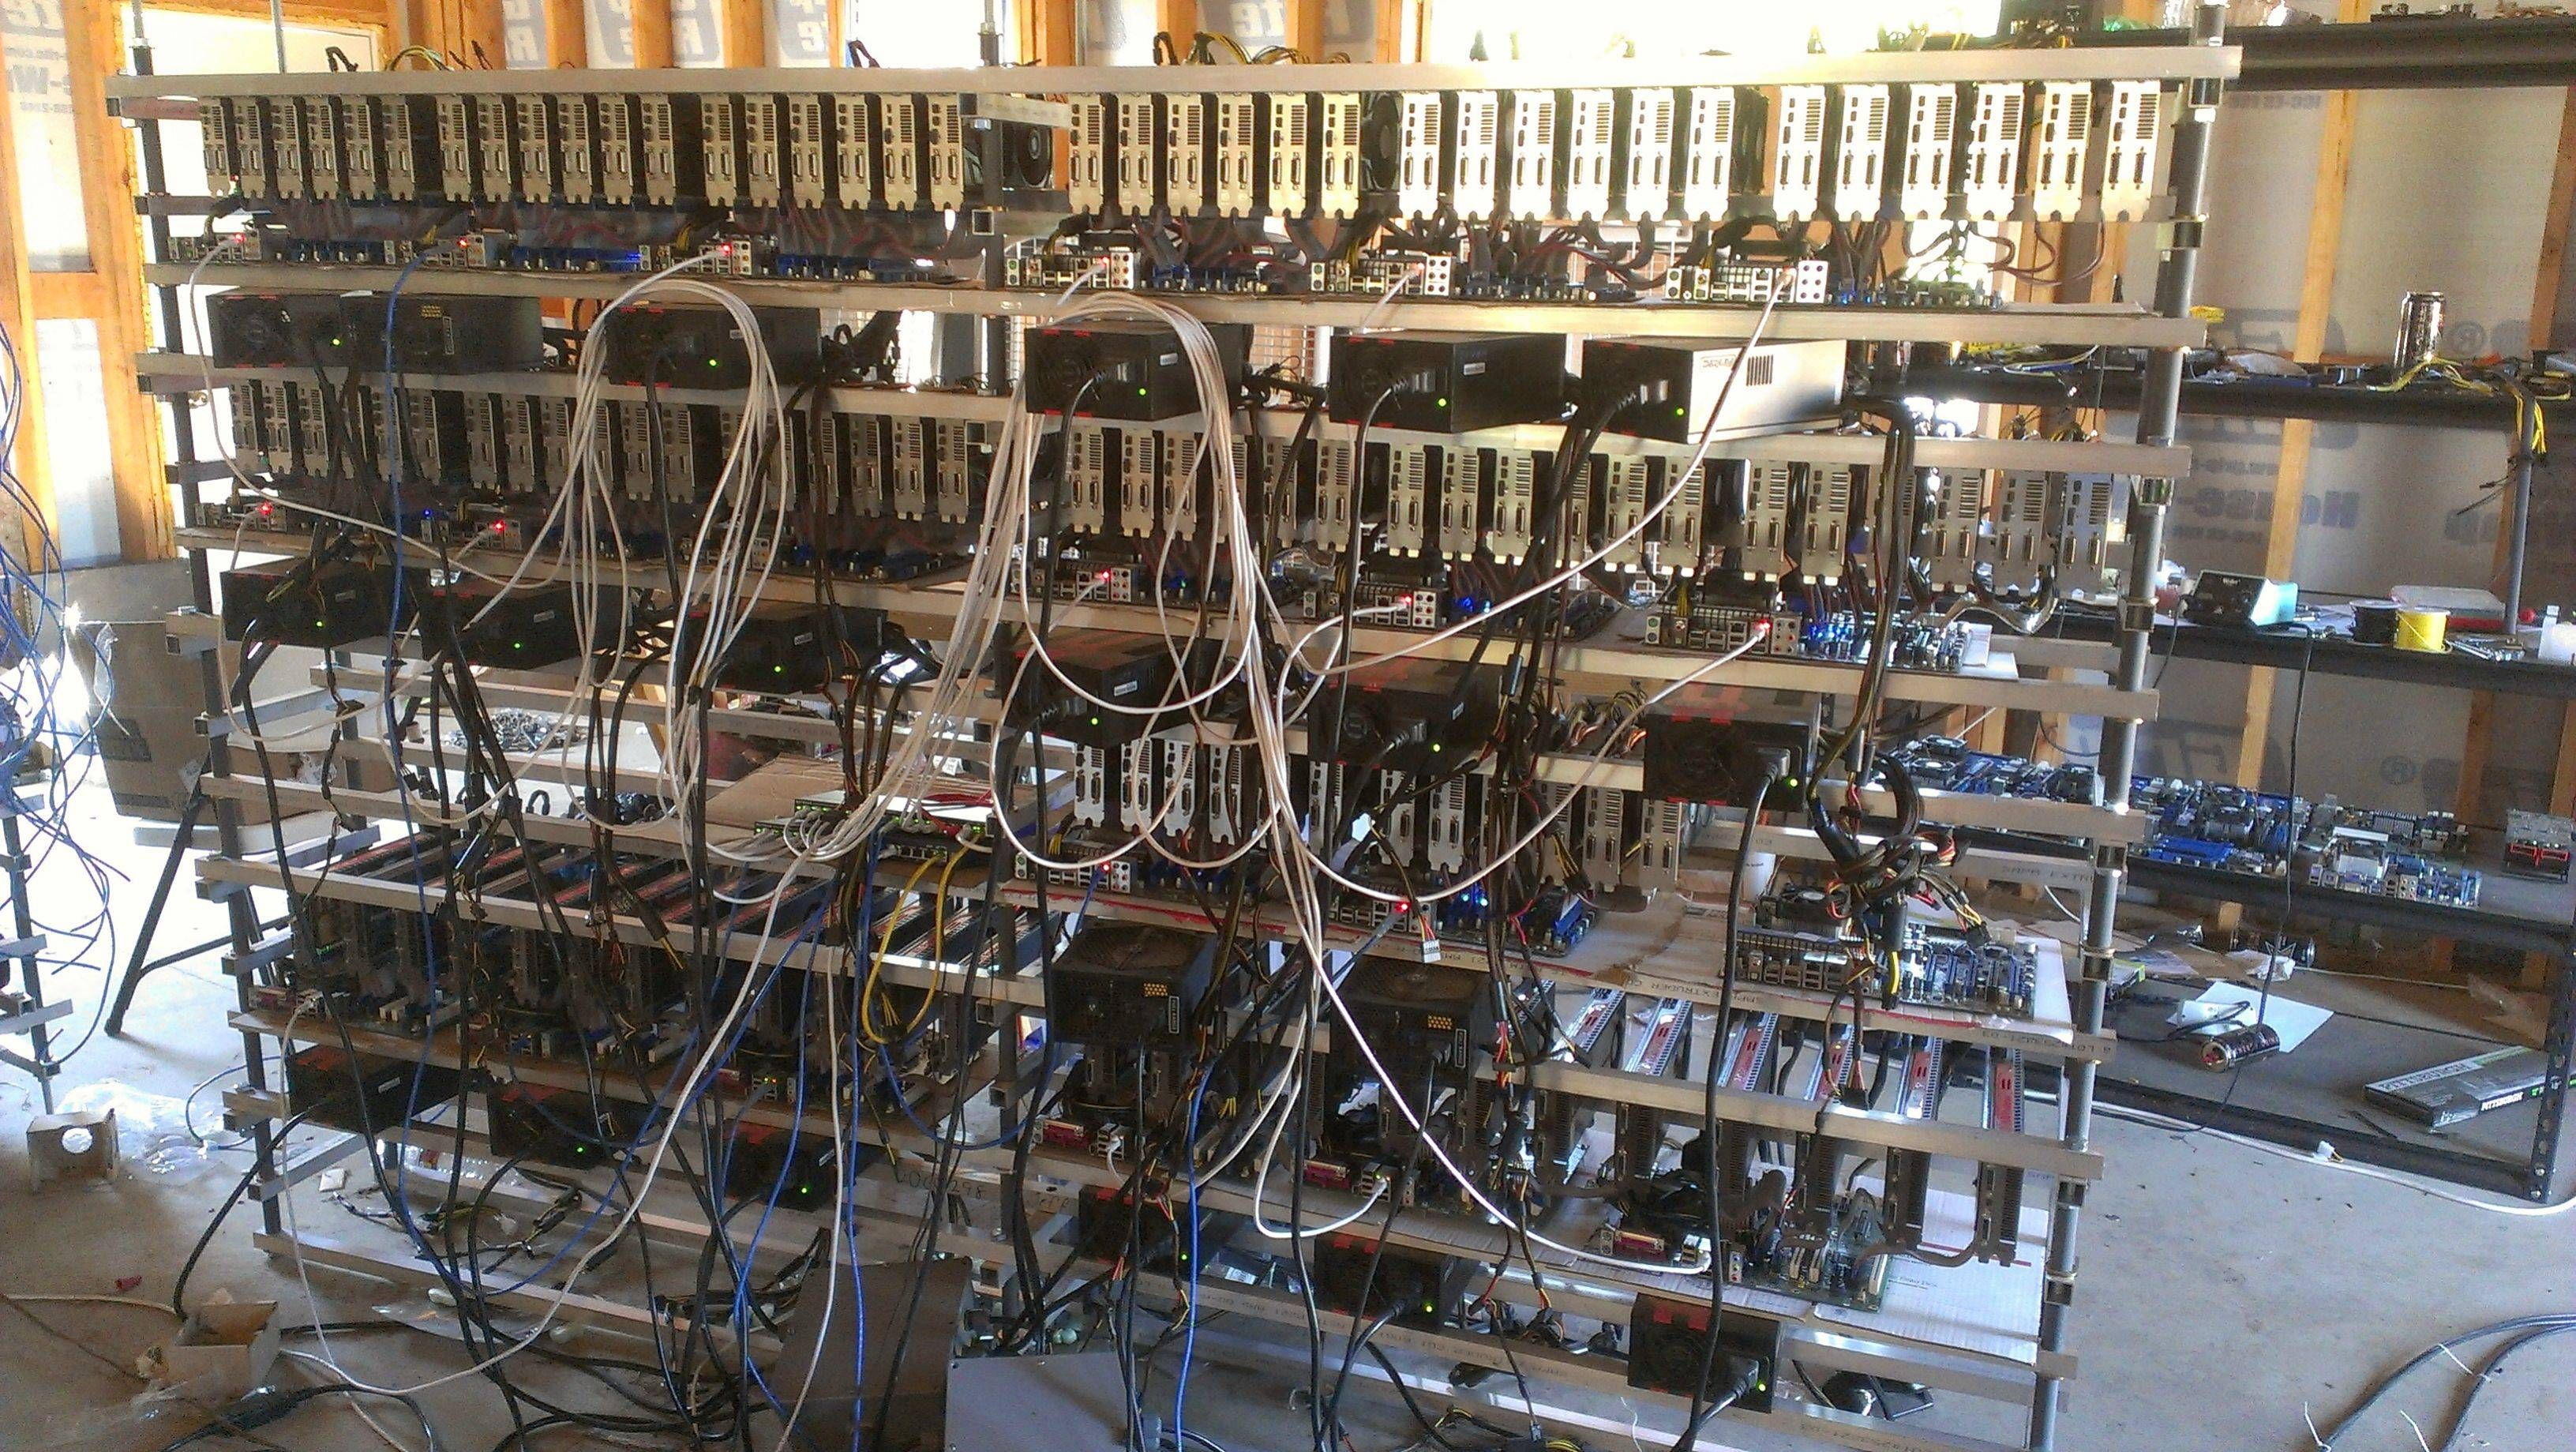 A bitcoin mining rig. This thing has sooooooo many GPUs D: